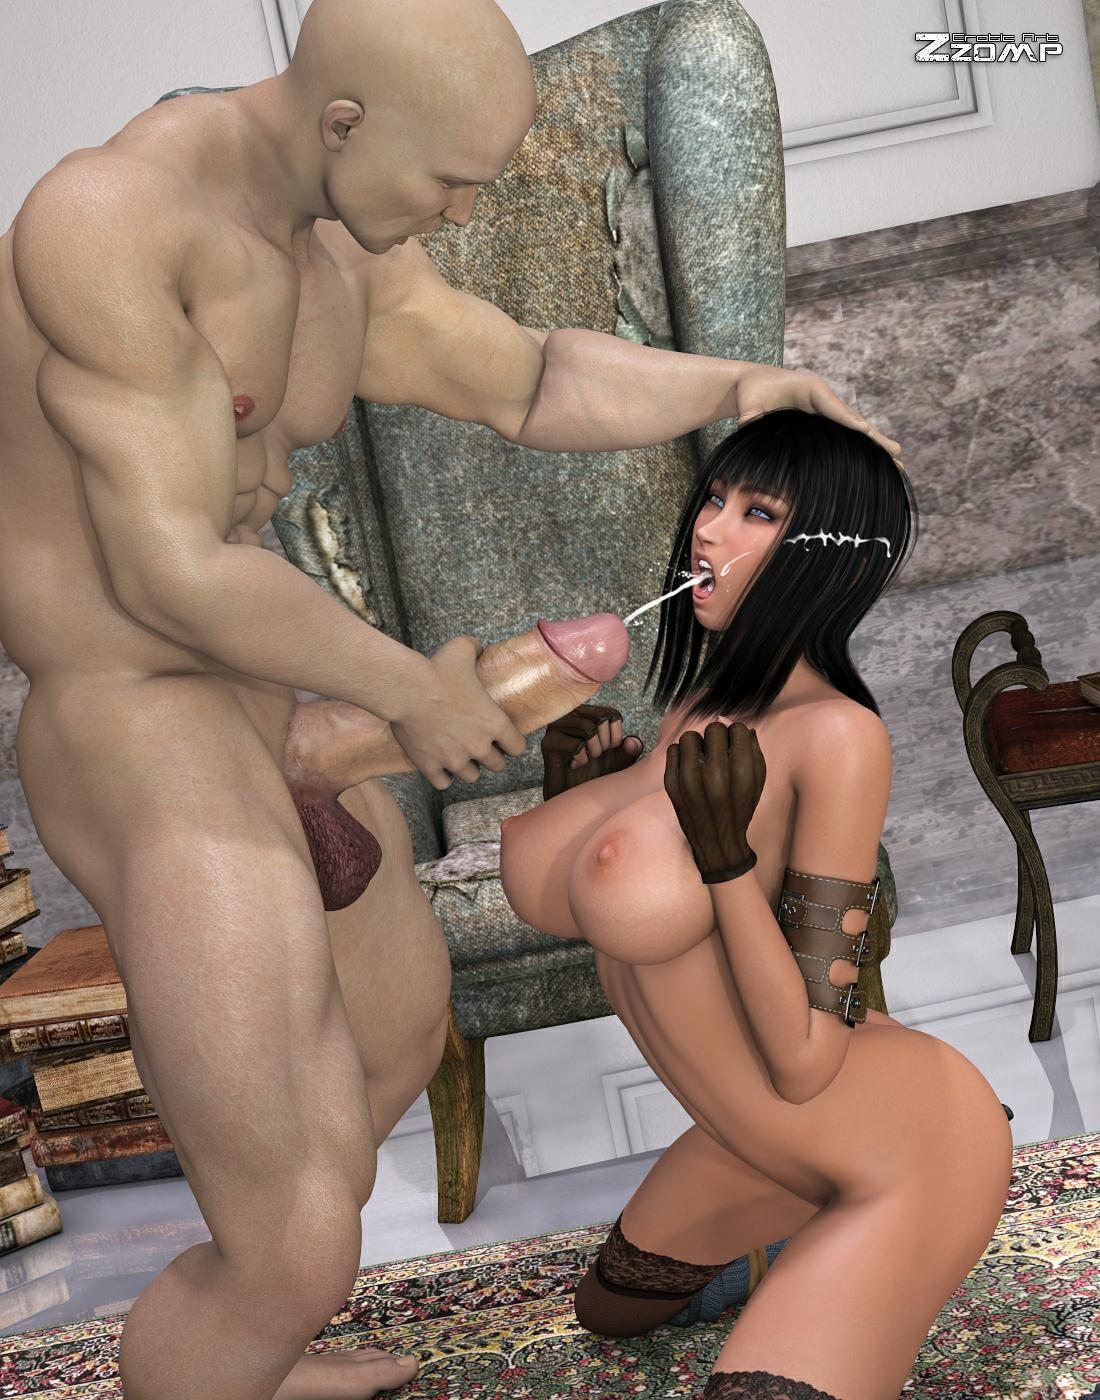 Anime with sexy demon girls xxx pic